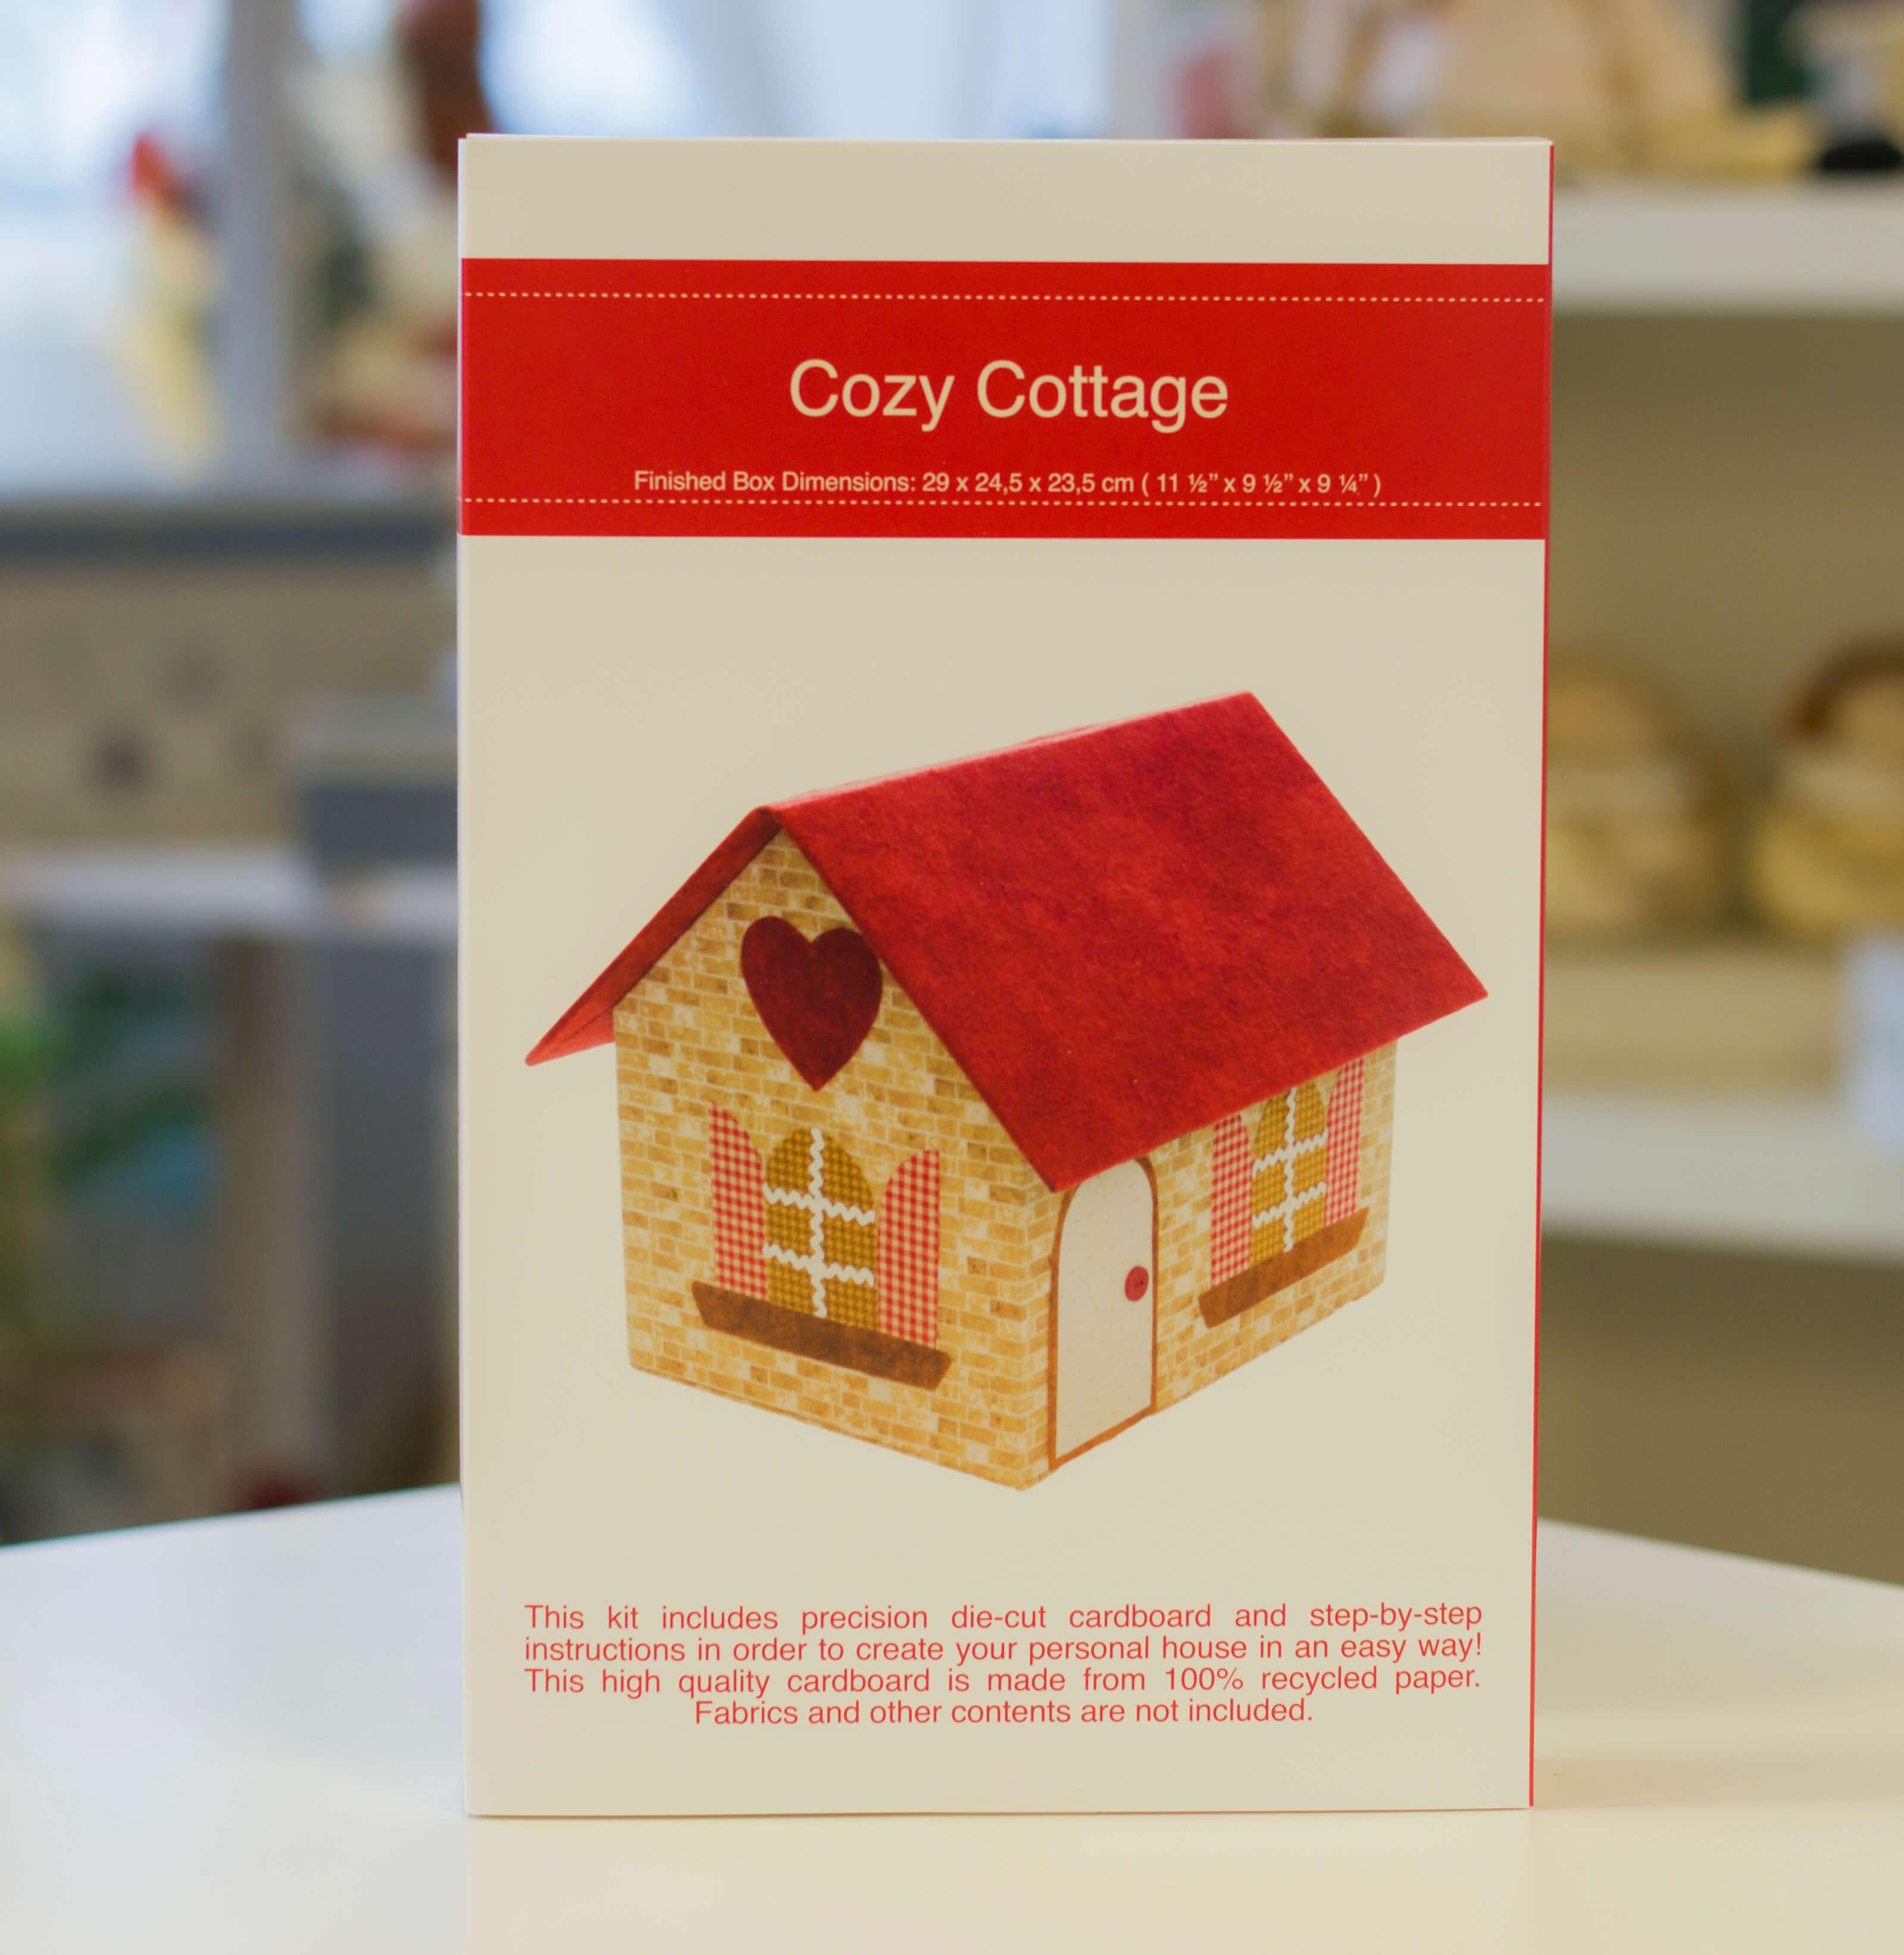 cozy cottage rh byannie com cozy cottage fabrics and alterations augusta maine cozy cottage fabrics augusta me